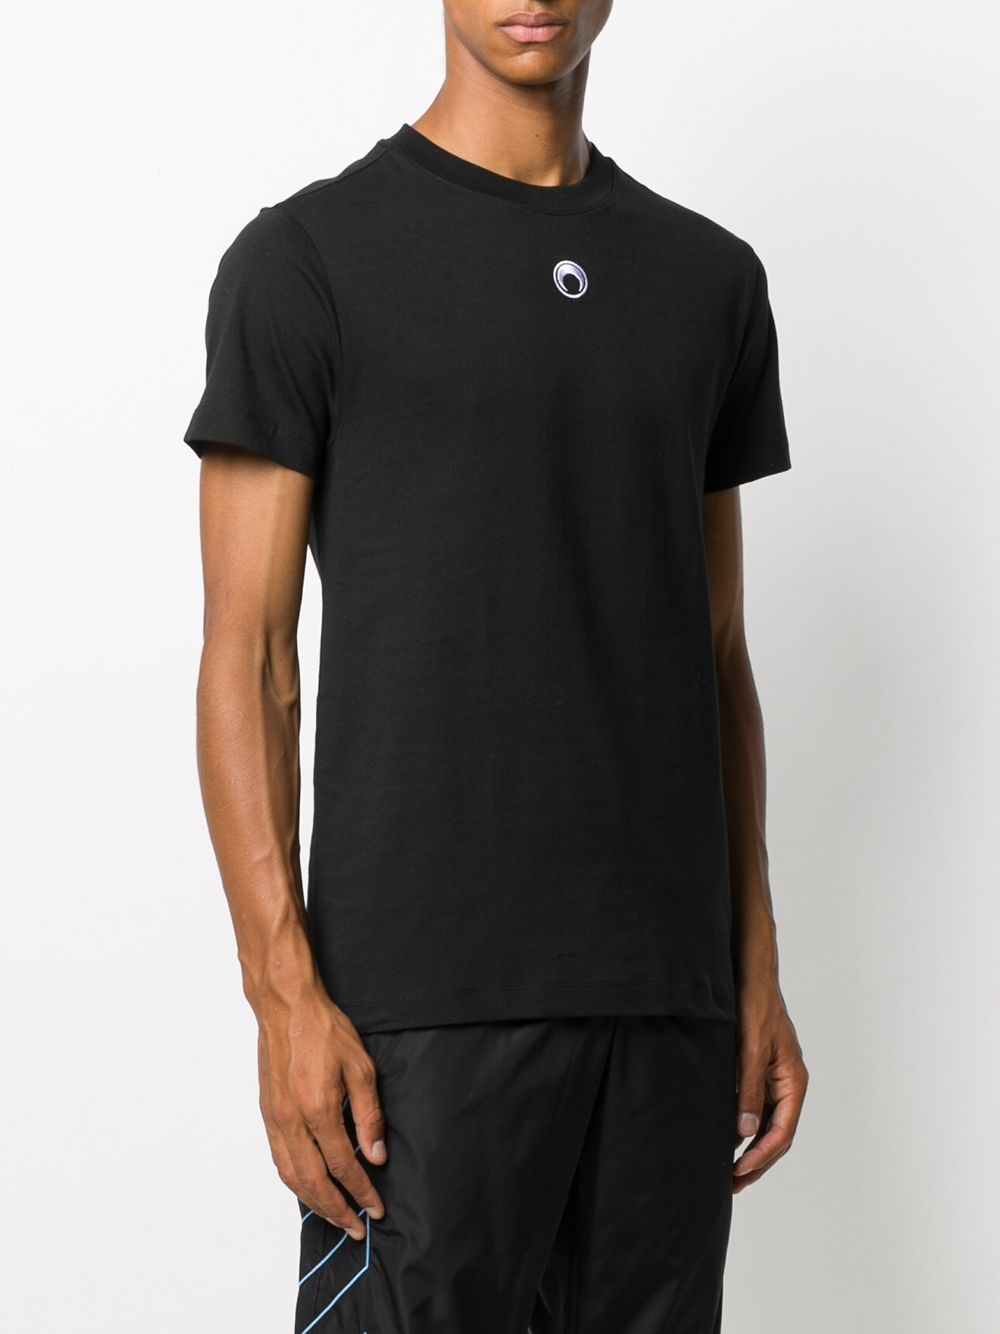 LOGO T-SHIRT MARINE SERRE | T-shirts | T035FW20M0